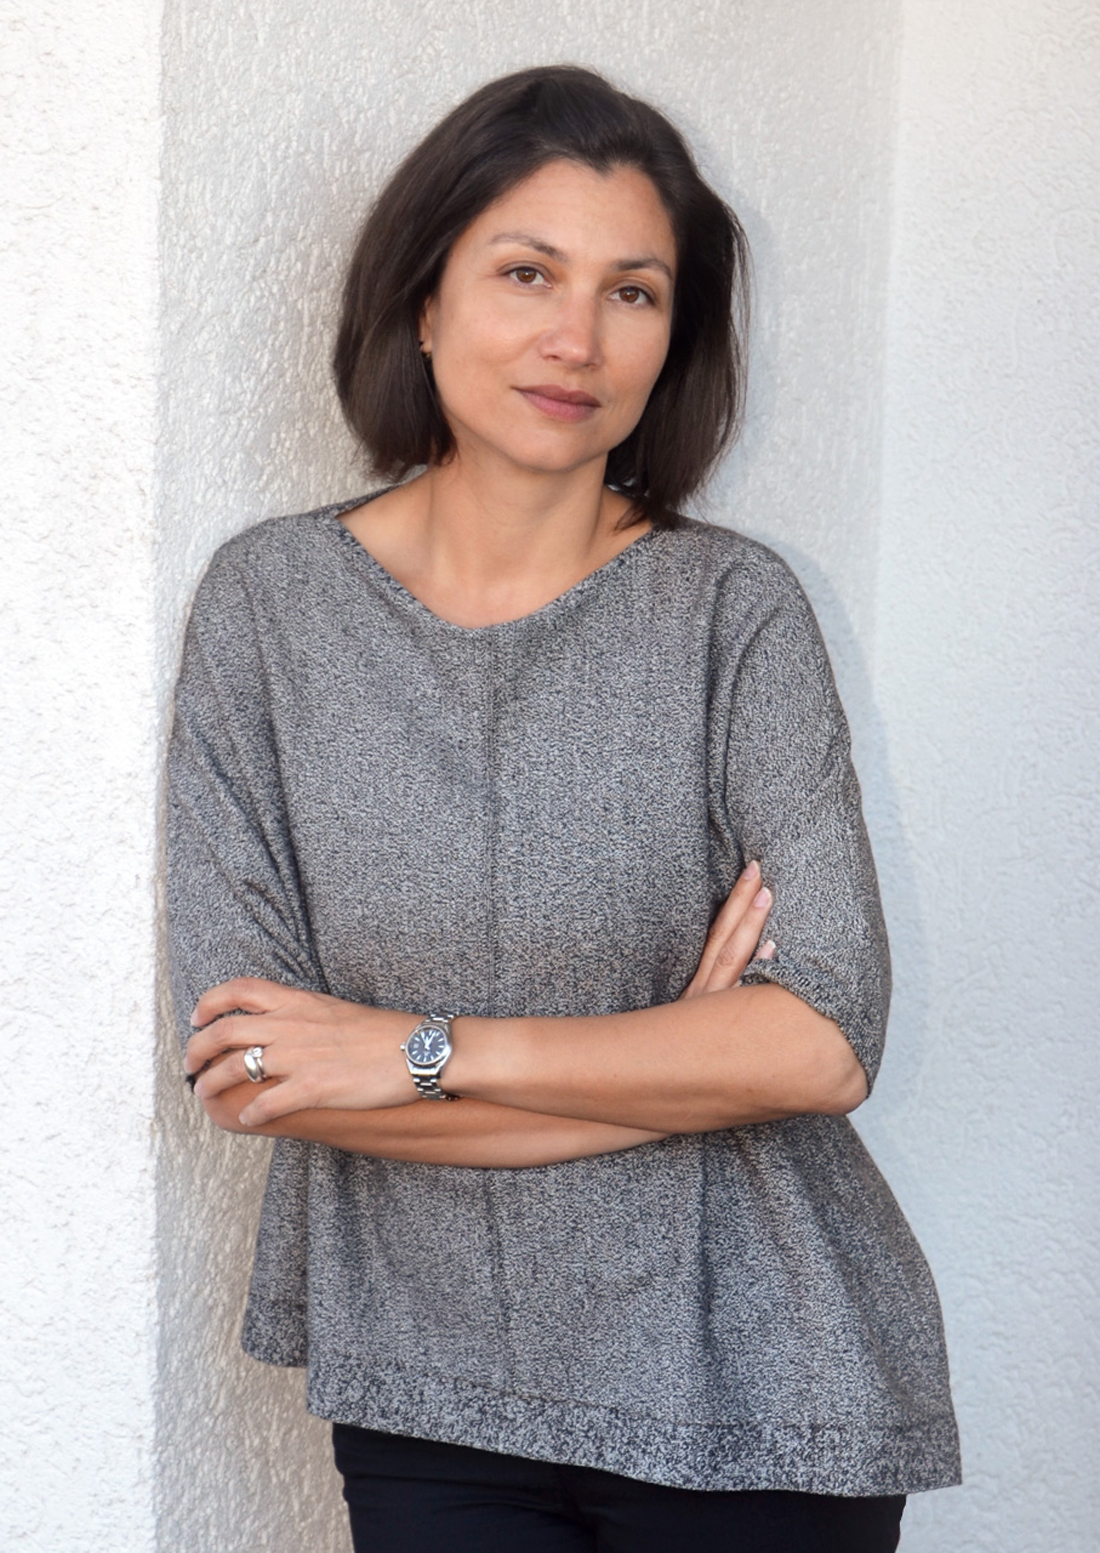 Martina Gabriel